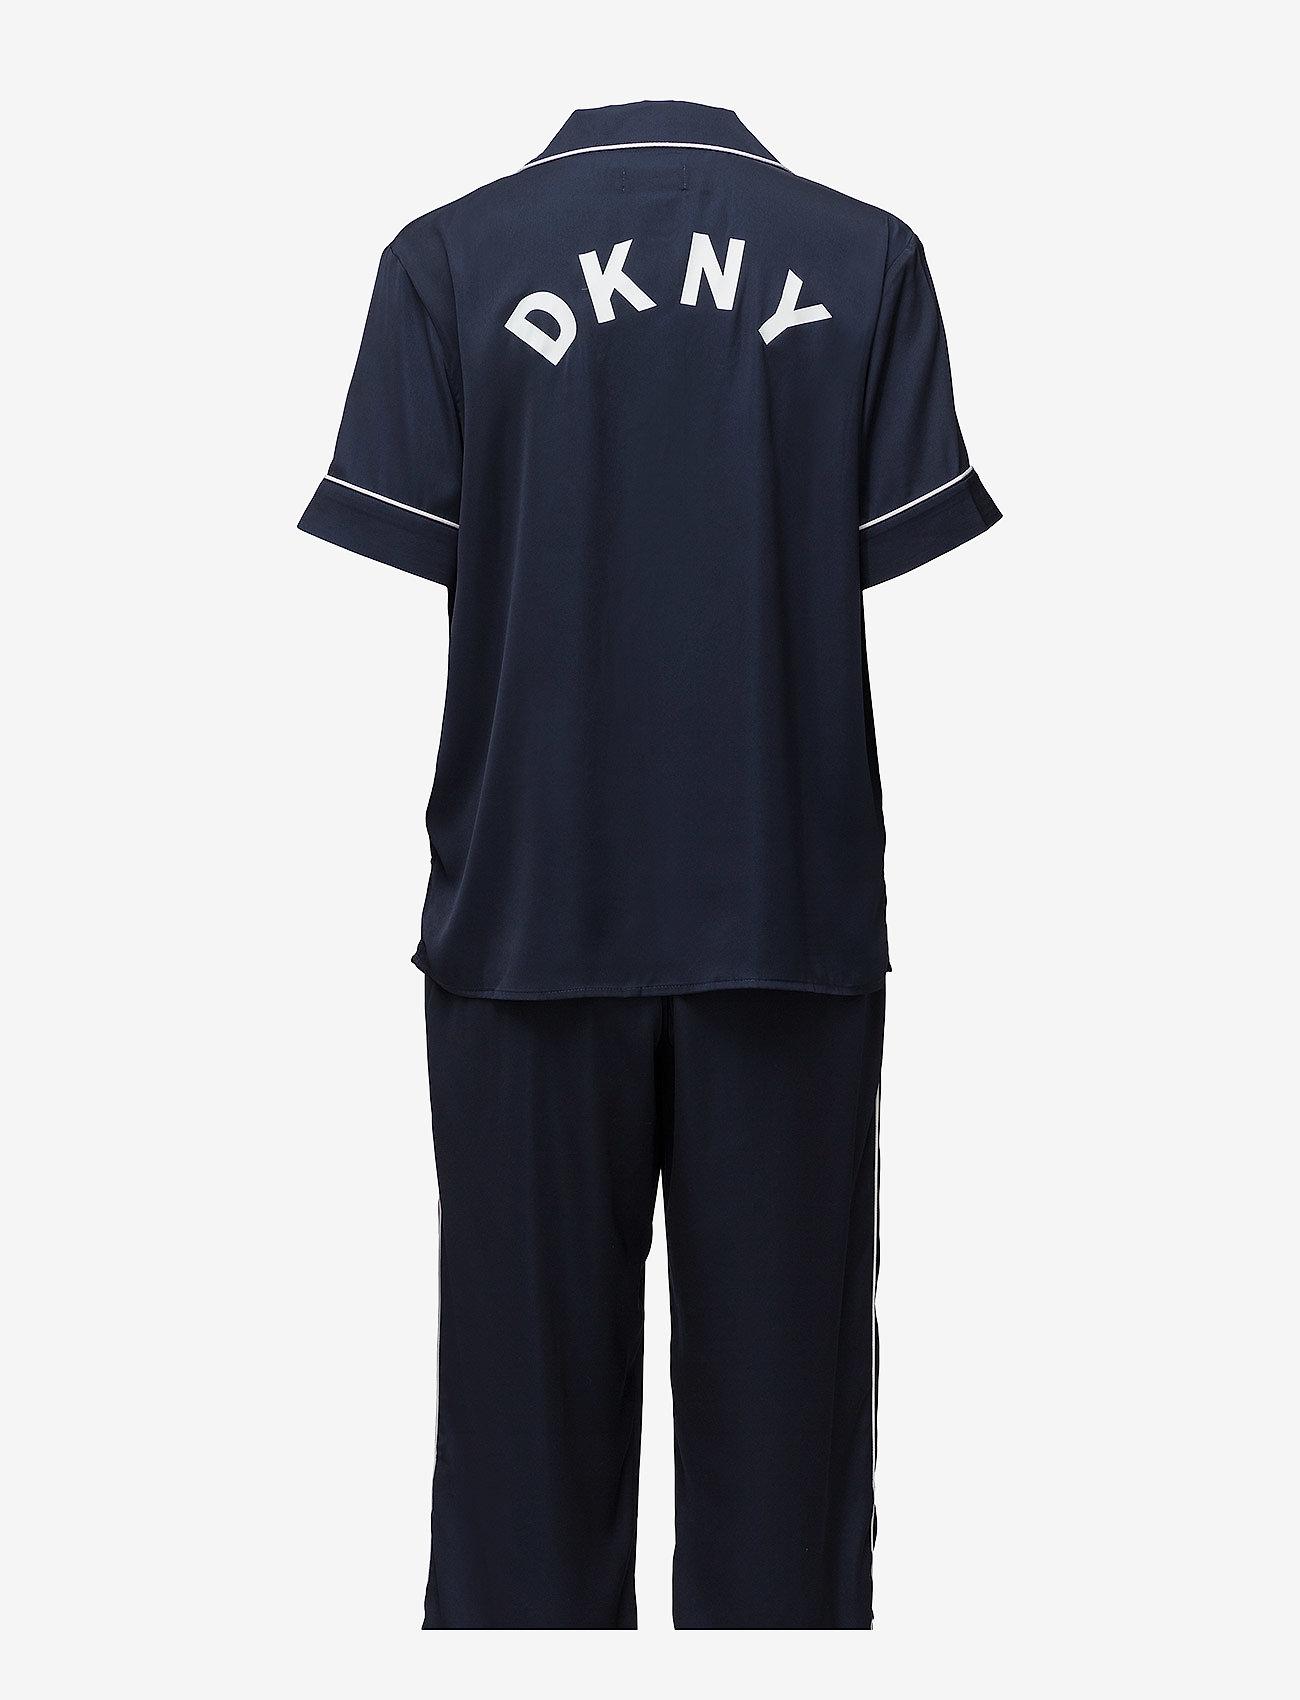 Dkny Walk The Line Top & Crop Pant (Navy) - DKNY Homewear bfCzZ4